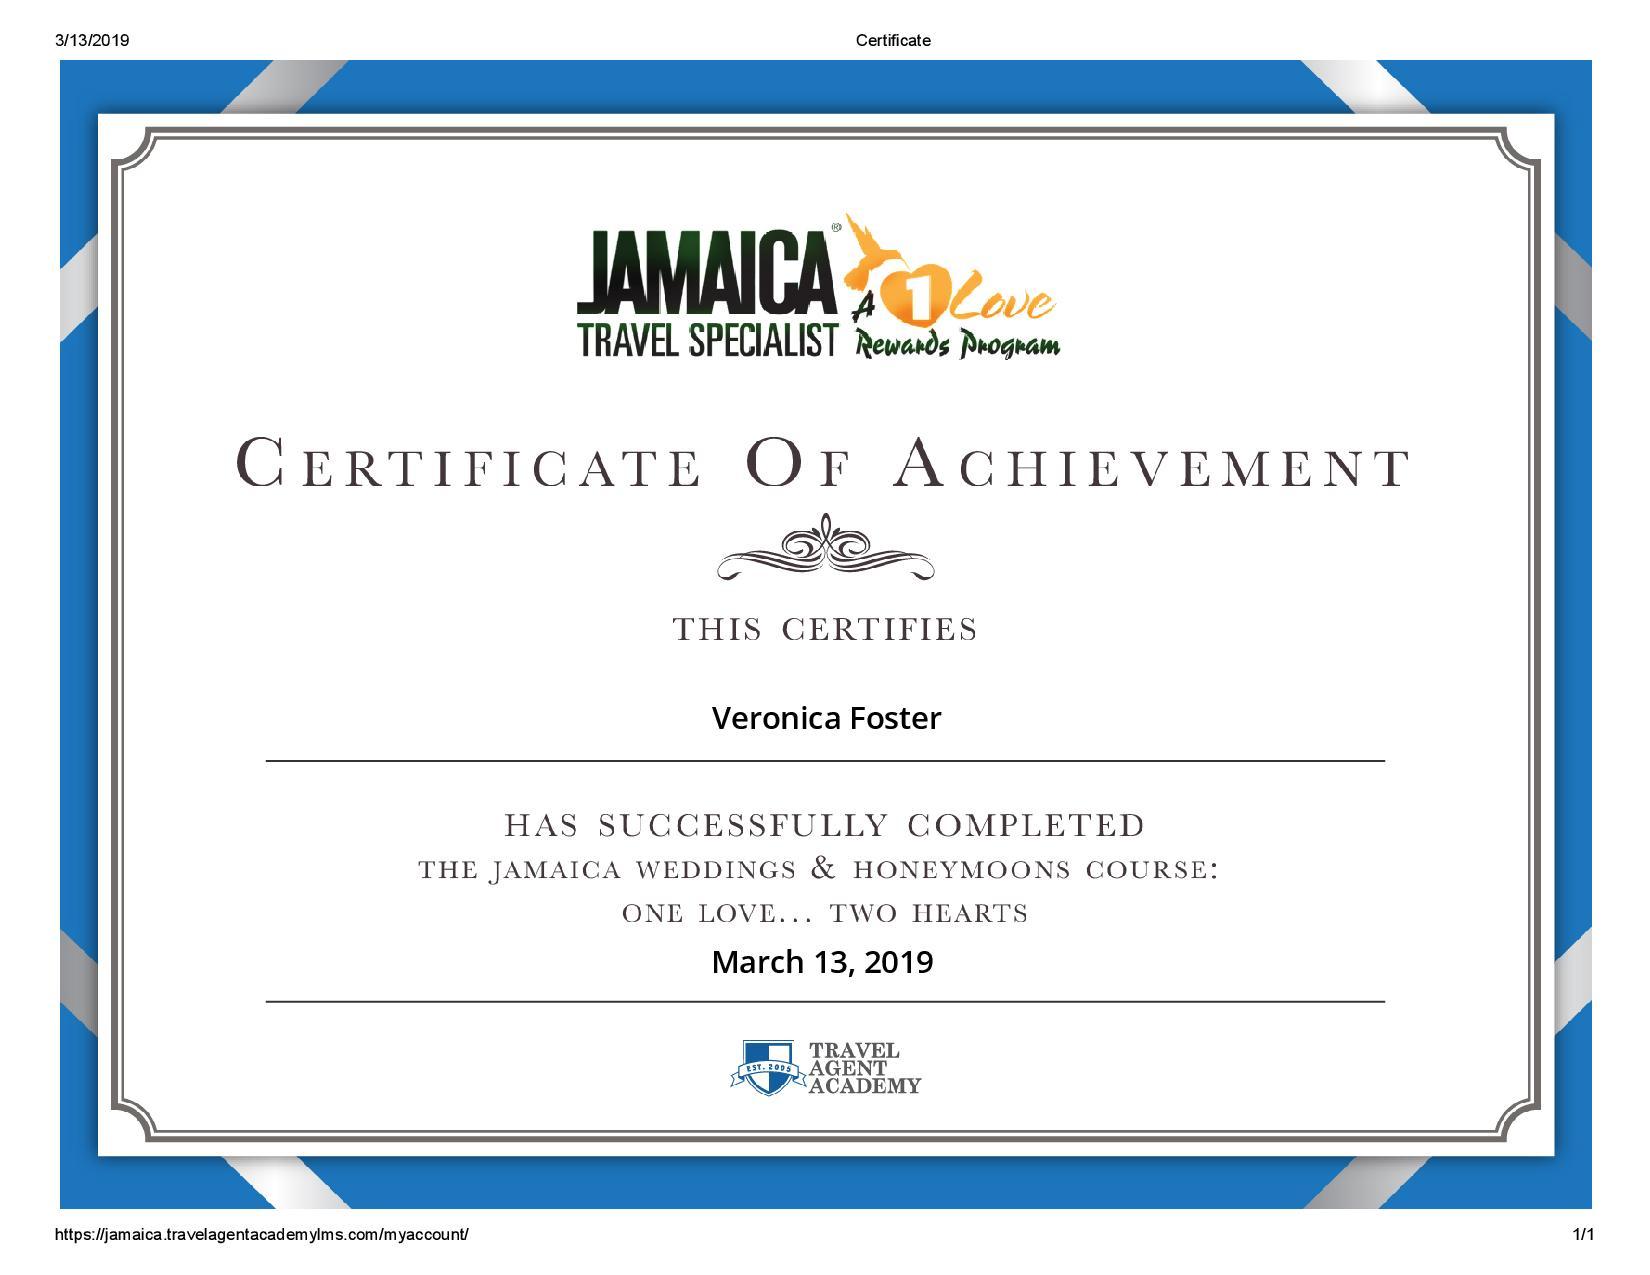 Jamaica Weddings & Honeymoon Course Certificate-page-001.jpg